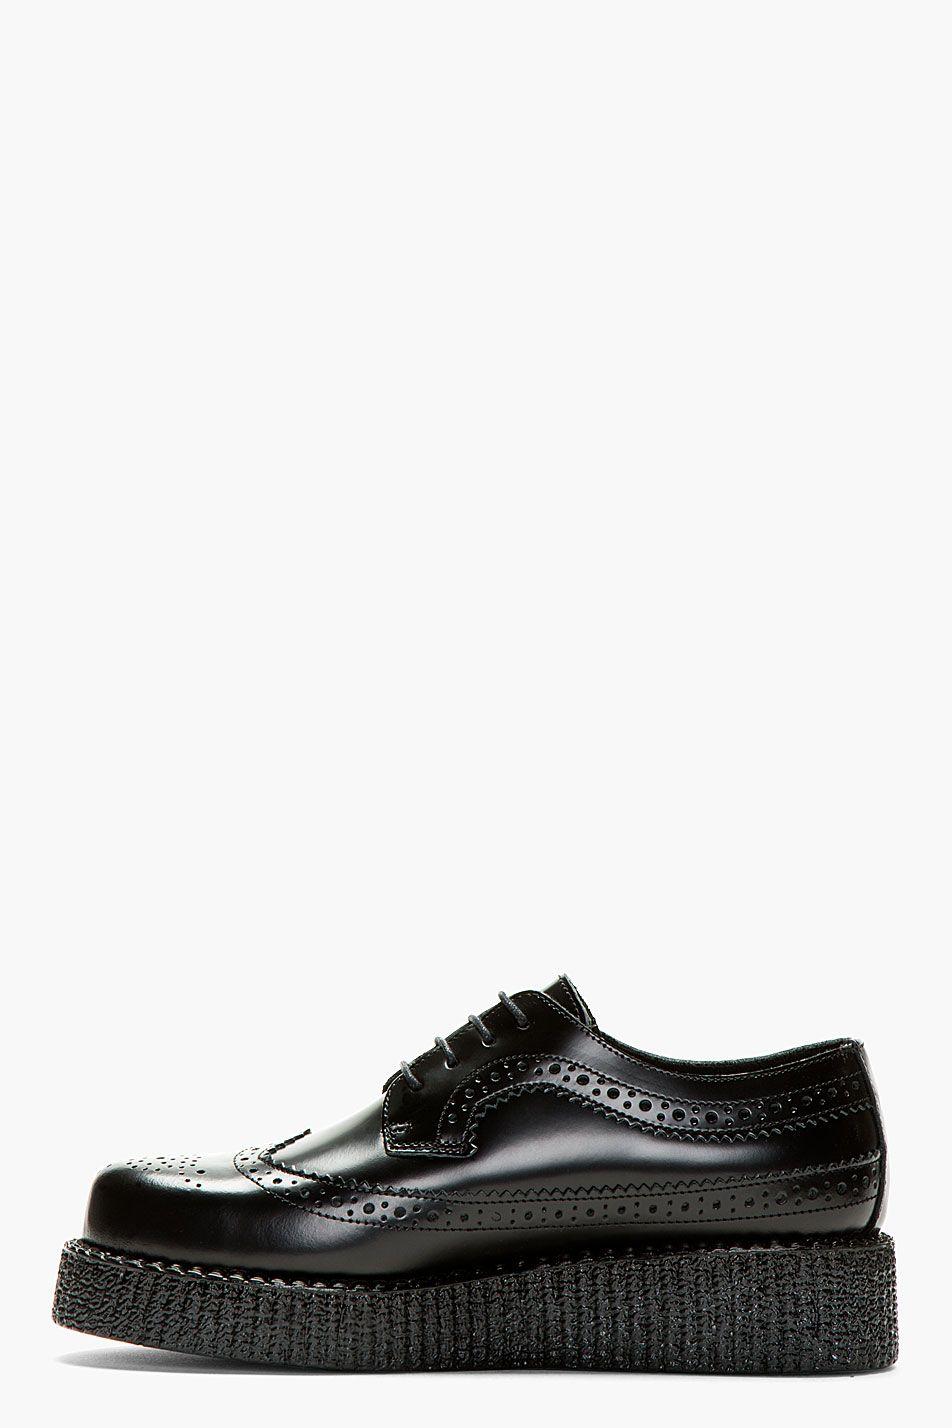 UNDERGROUND Black Buffed Leather Macbeth Wingtip Creeper Shoes ... 36f34c1d0c2